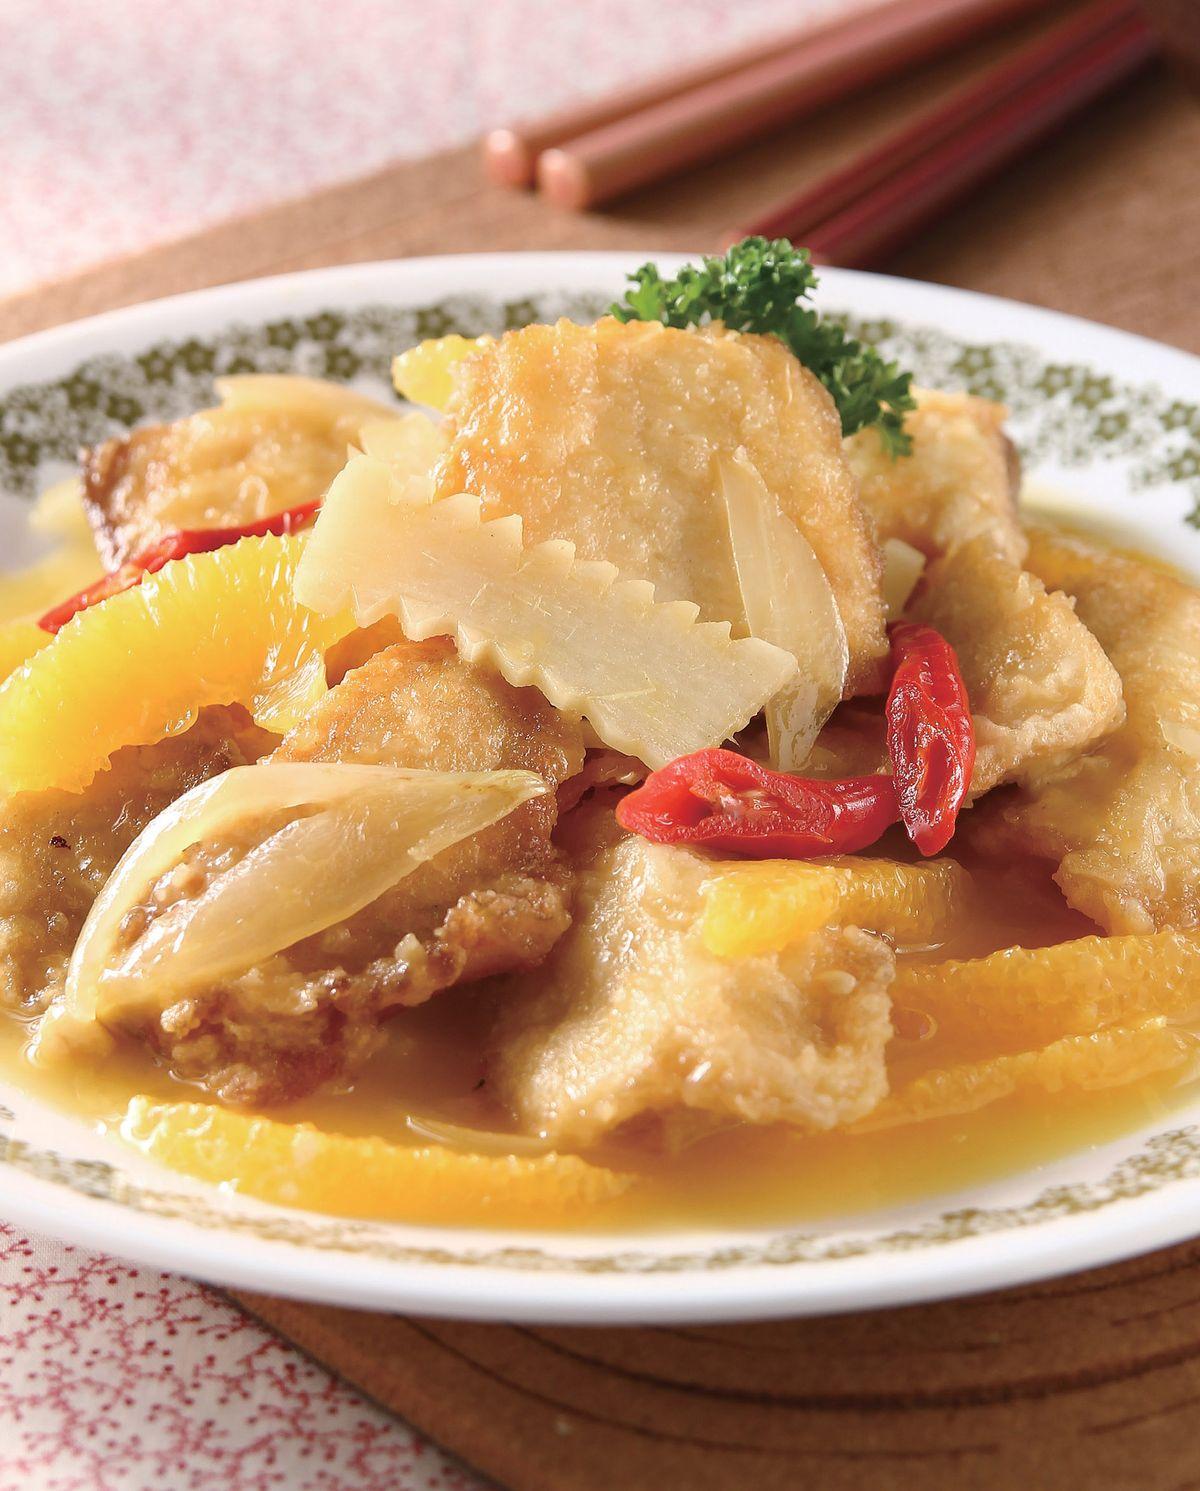 食譜:橙汁燒魚片